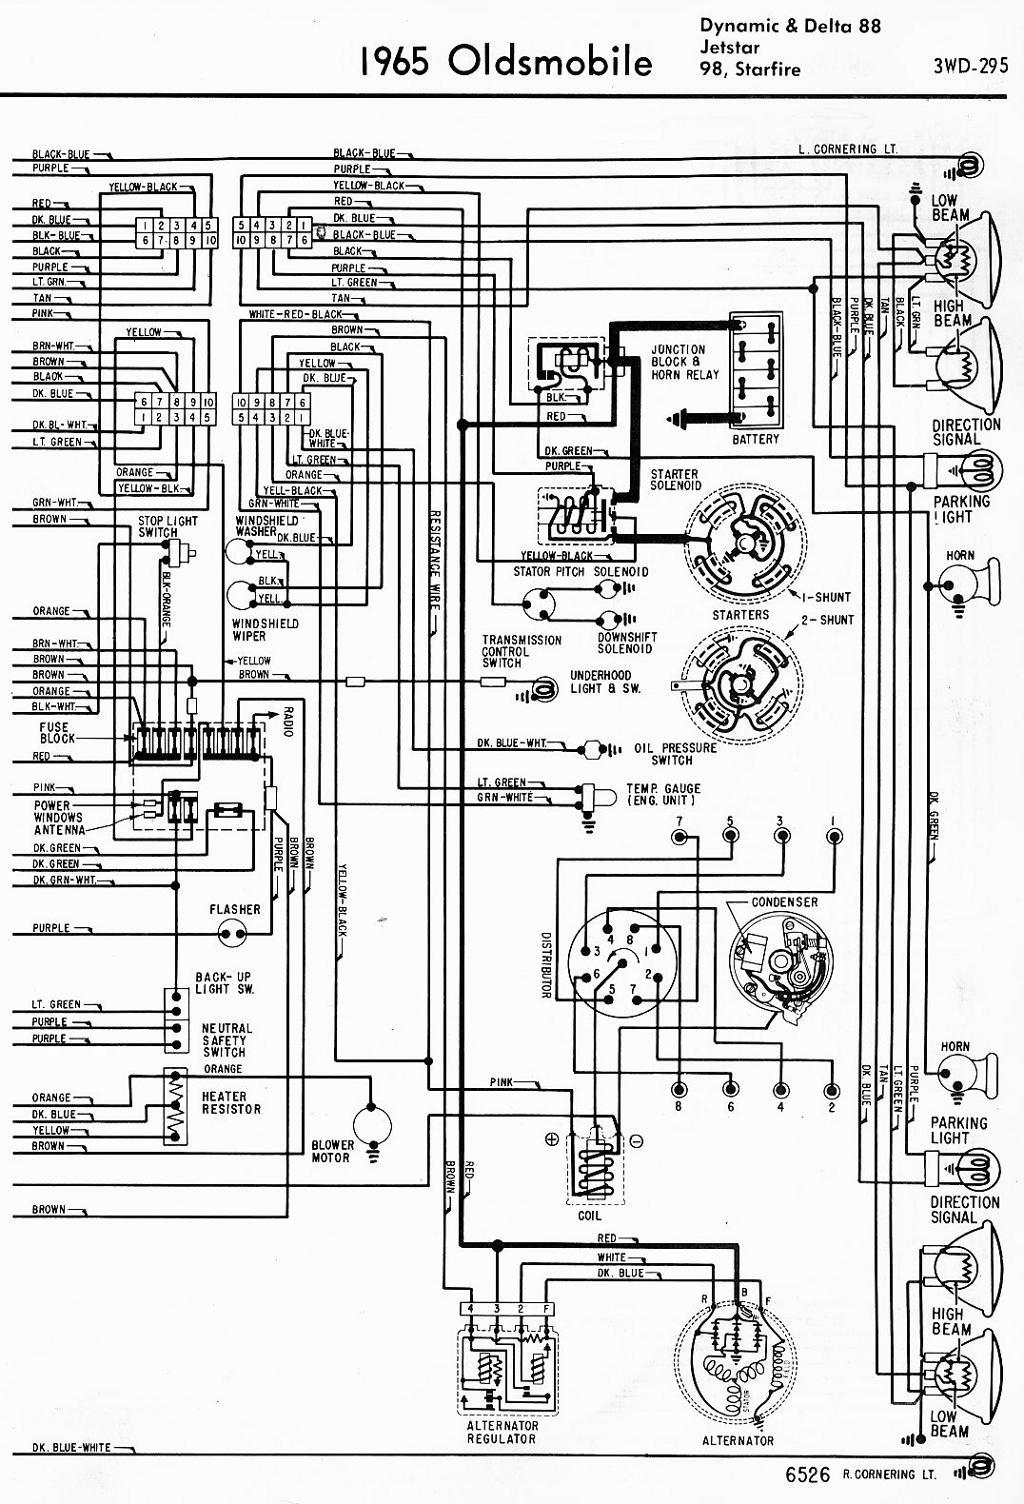 nissan serena fuse box location nissan temp sensor wiring diagram [ 1024 x 1504 Pixel ]